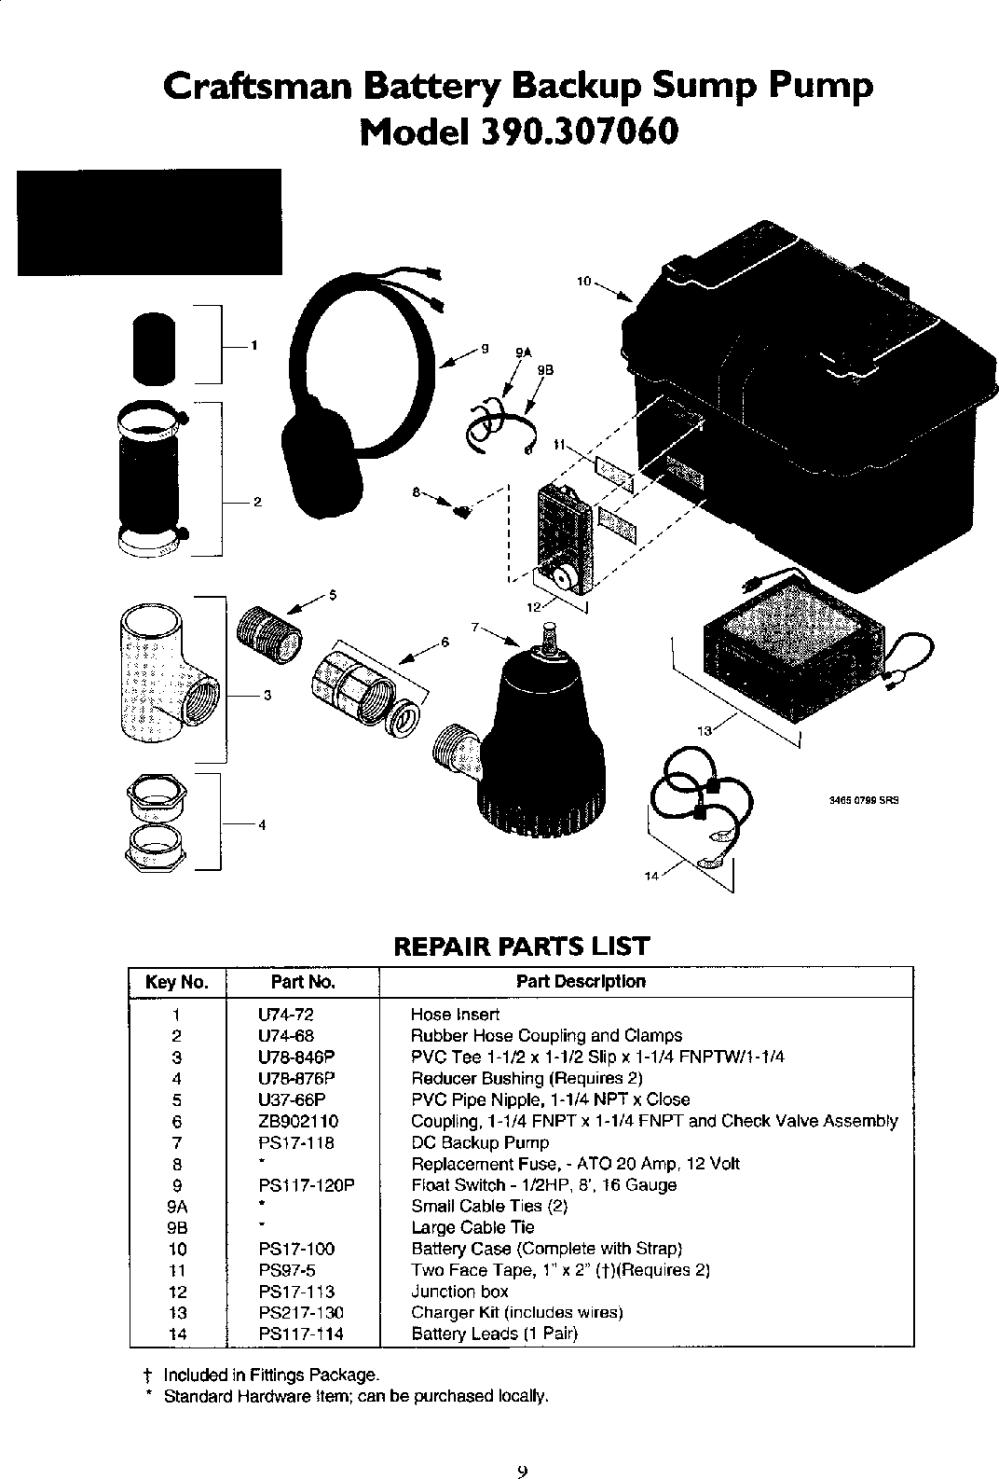 medium resolution of page 10 of 12 craftsman 390307060 user manual backup sump pump manuals and guides